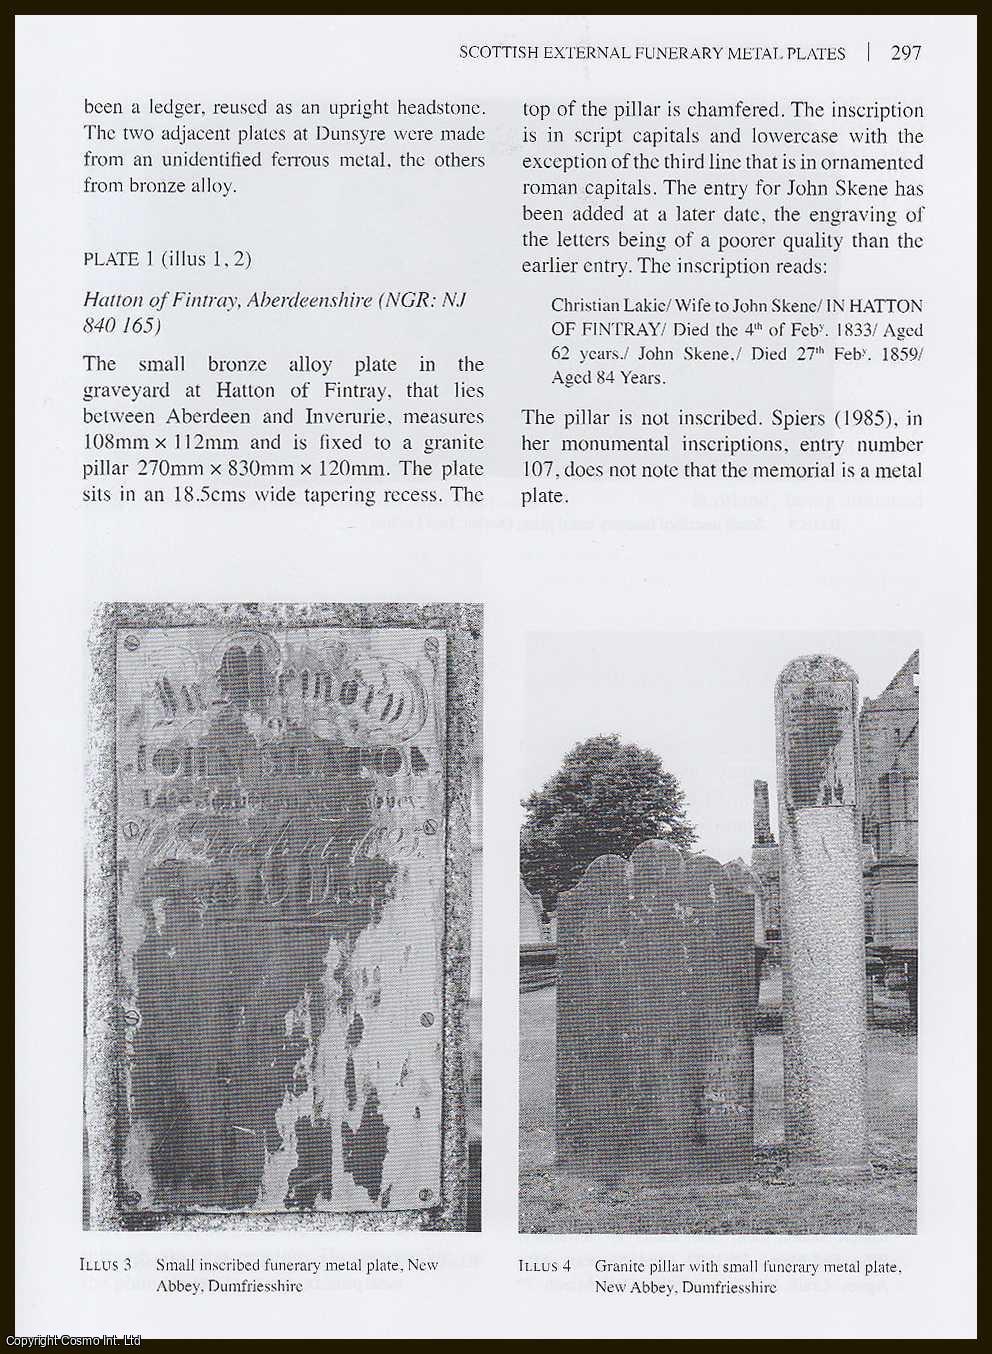 THOMSON, GEORGE - Scottish External Funerary Metal Plates.